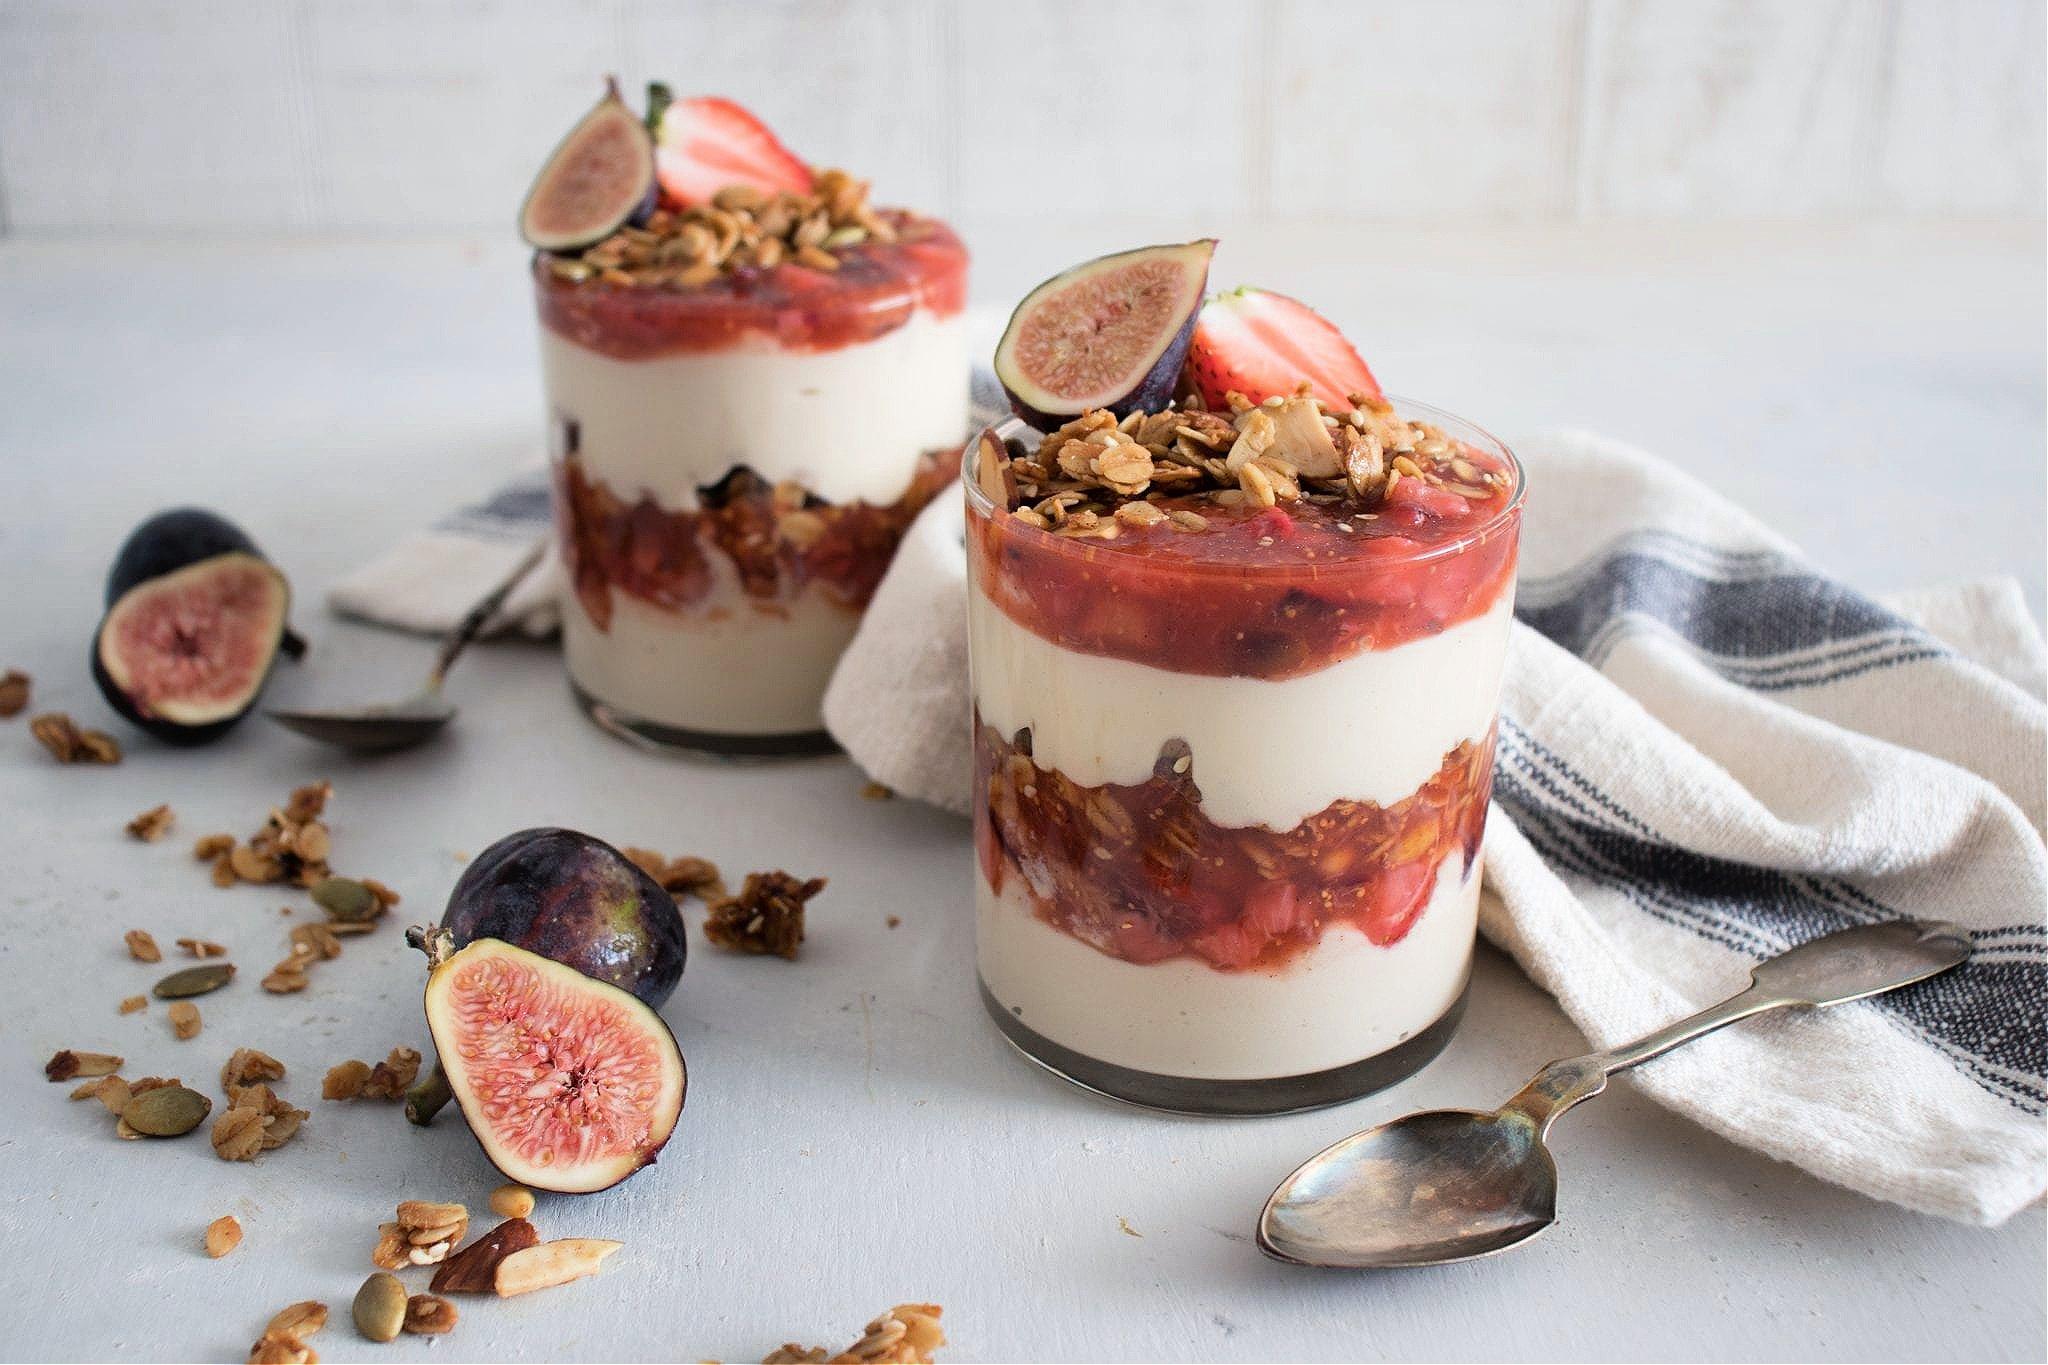 Tahini-Yogurt慕斯冻糕配无花果和草莓橄榄油蜜饯